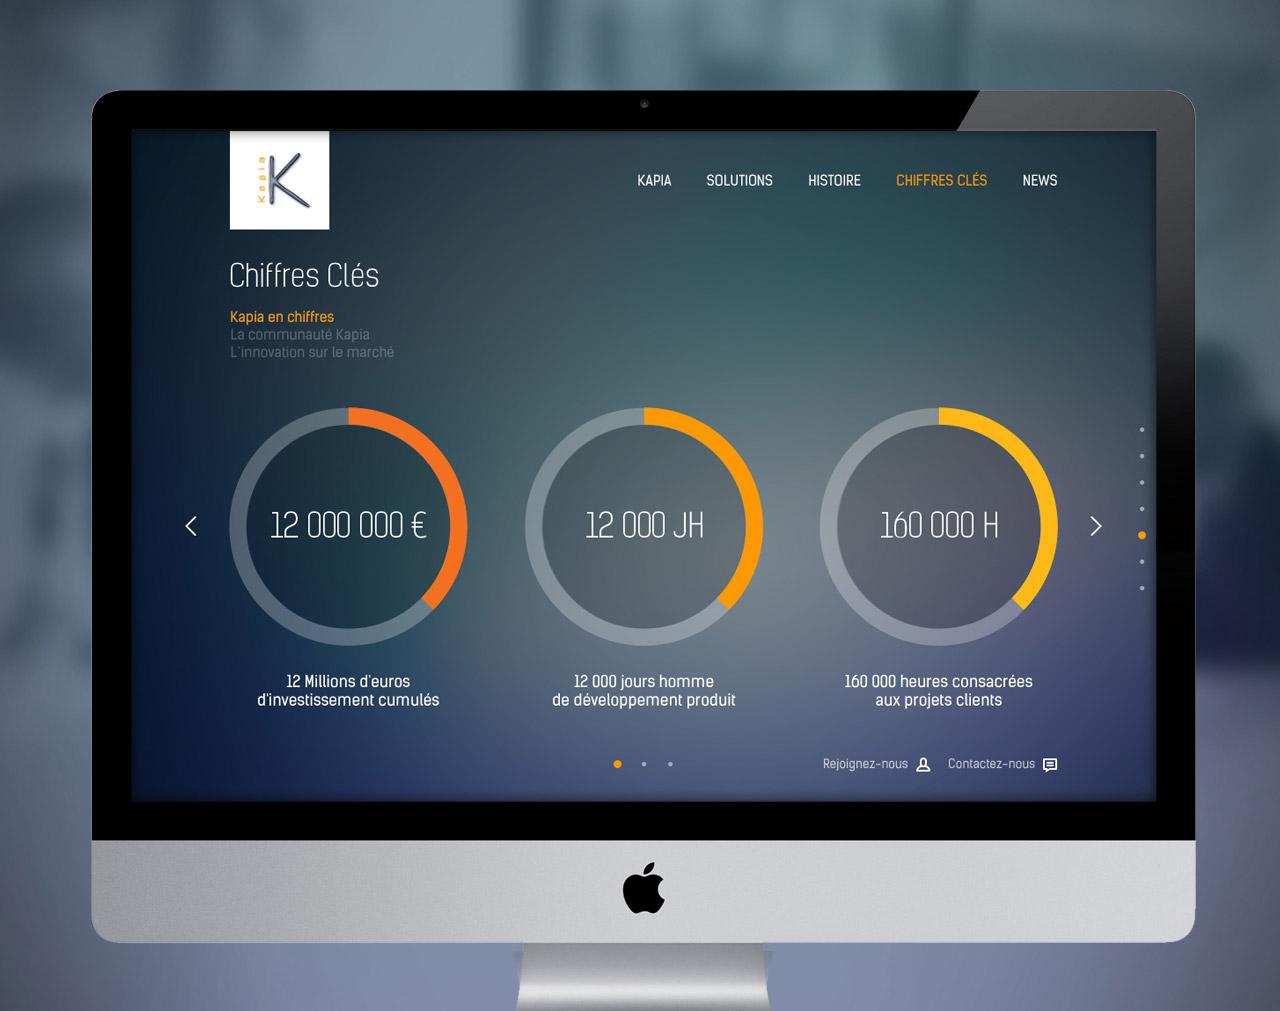 kapia-solutions-chiffres-1-site-internet-responsive-design-creation-communication-caconcept-alexis-cretin-graphiste